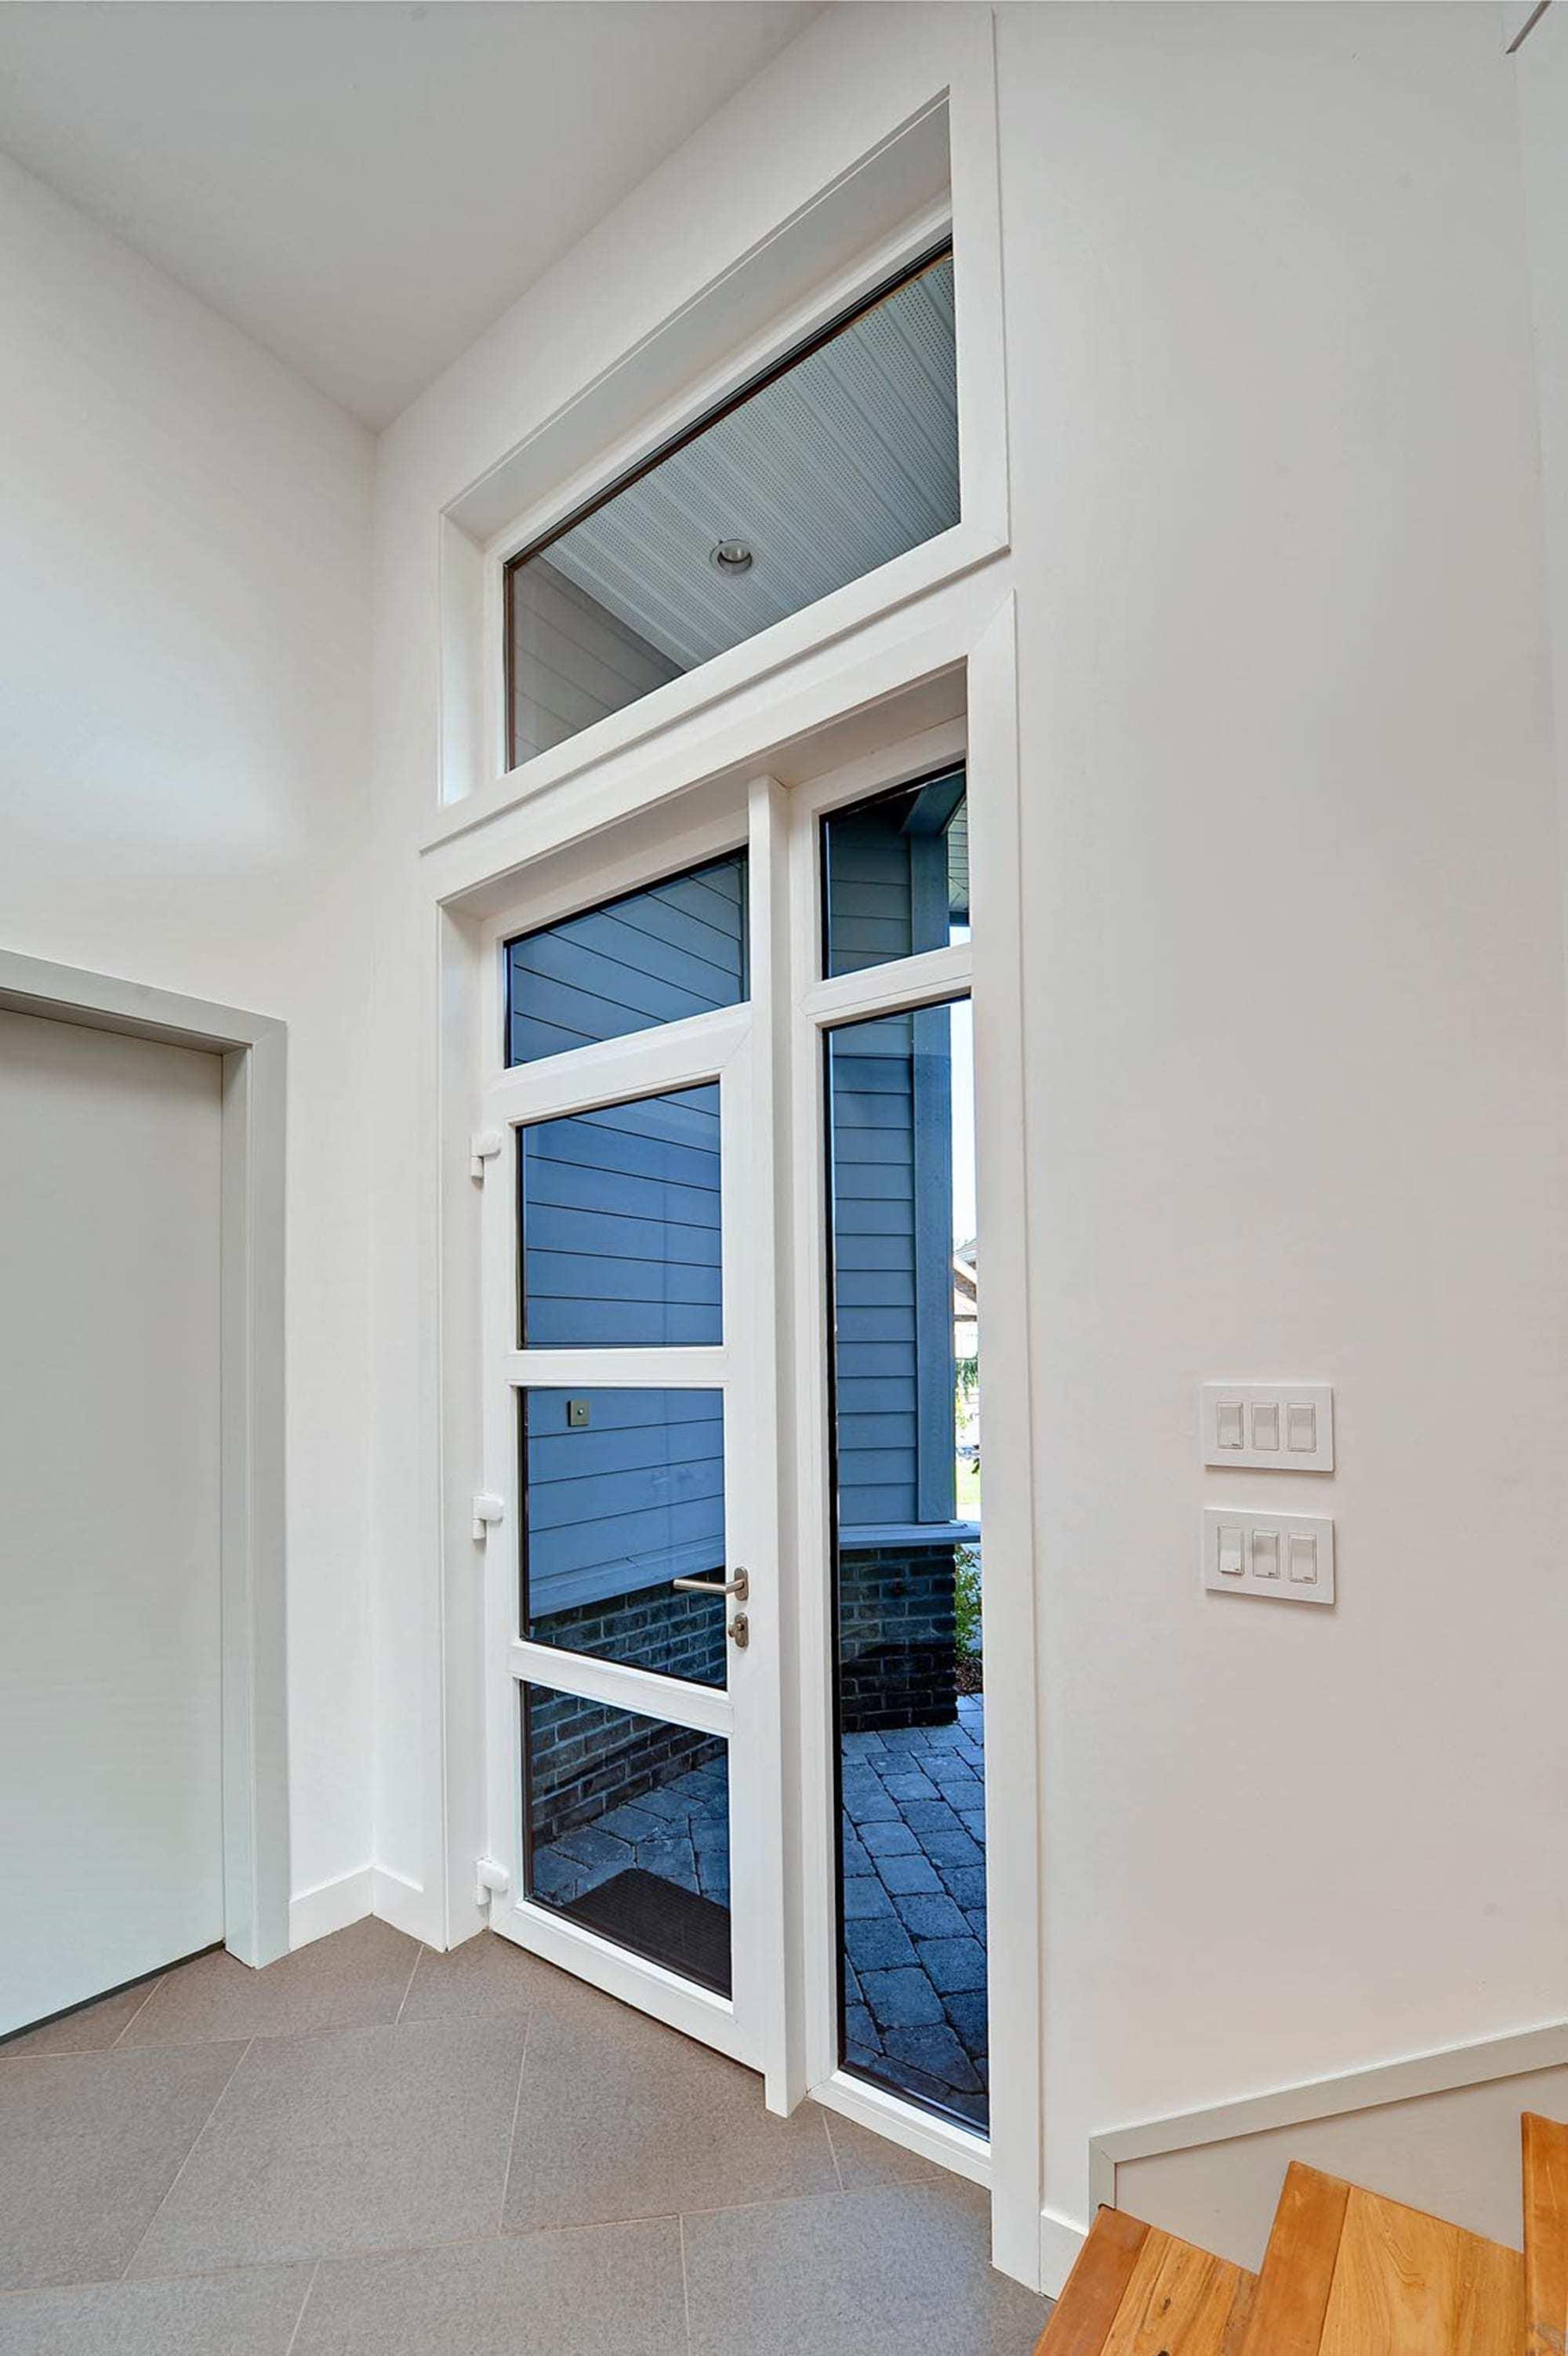 Haustür glas sprossen  TROCAL 88+ Kunststoff-Haustürsystem Standard | TROCAL